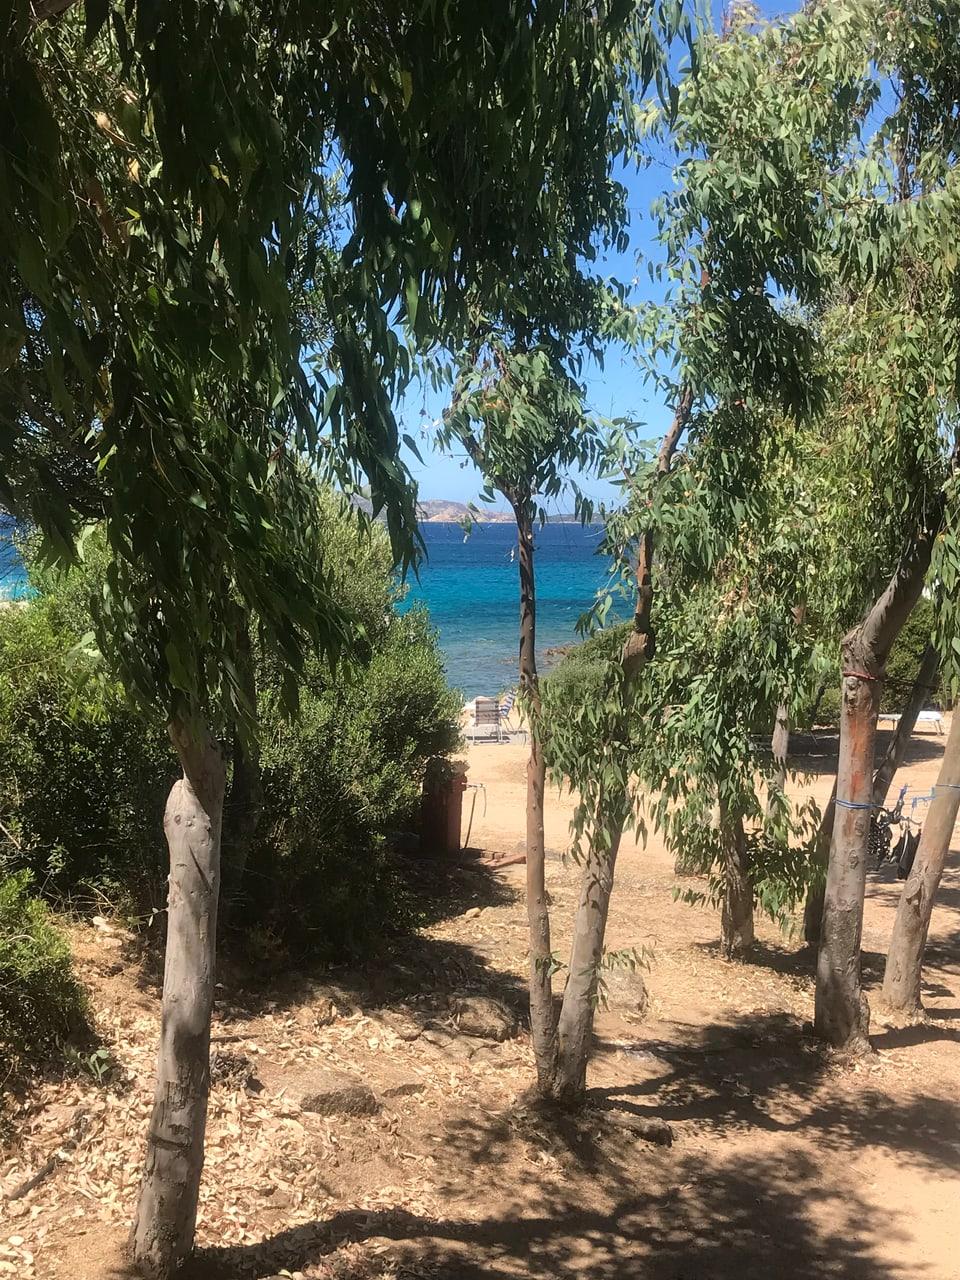 Vista sin la mar ord da nossa rulotta en Sardegna